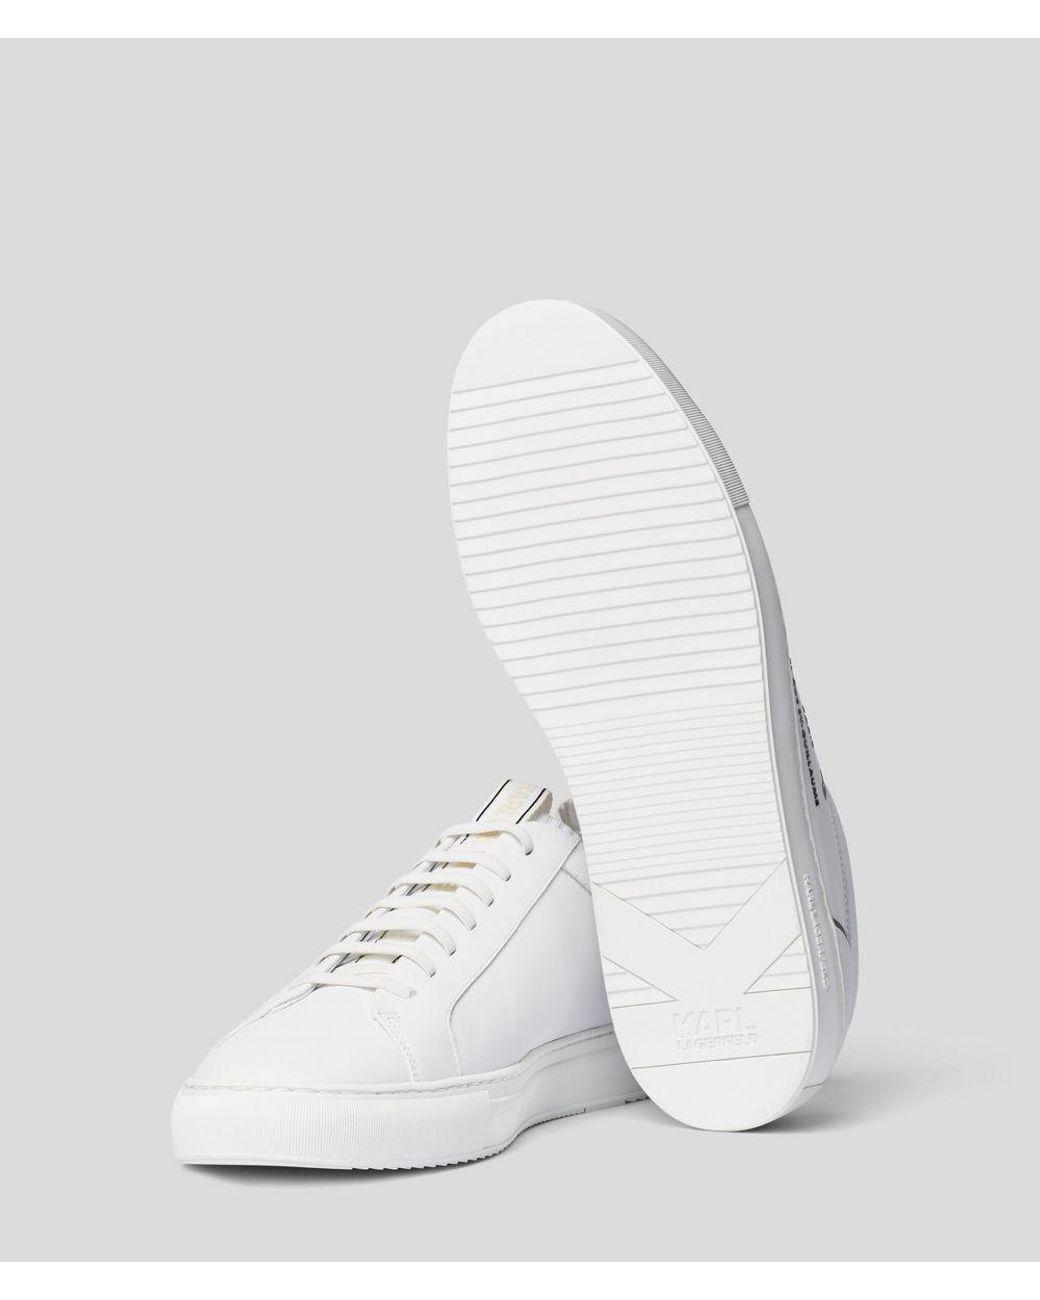 Karl Lagerfeld Leather Maison Karl Kupsole Sneaker in White